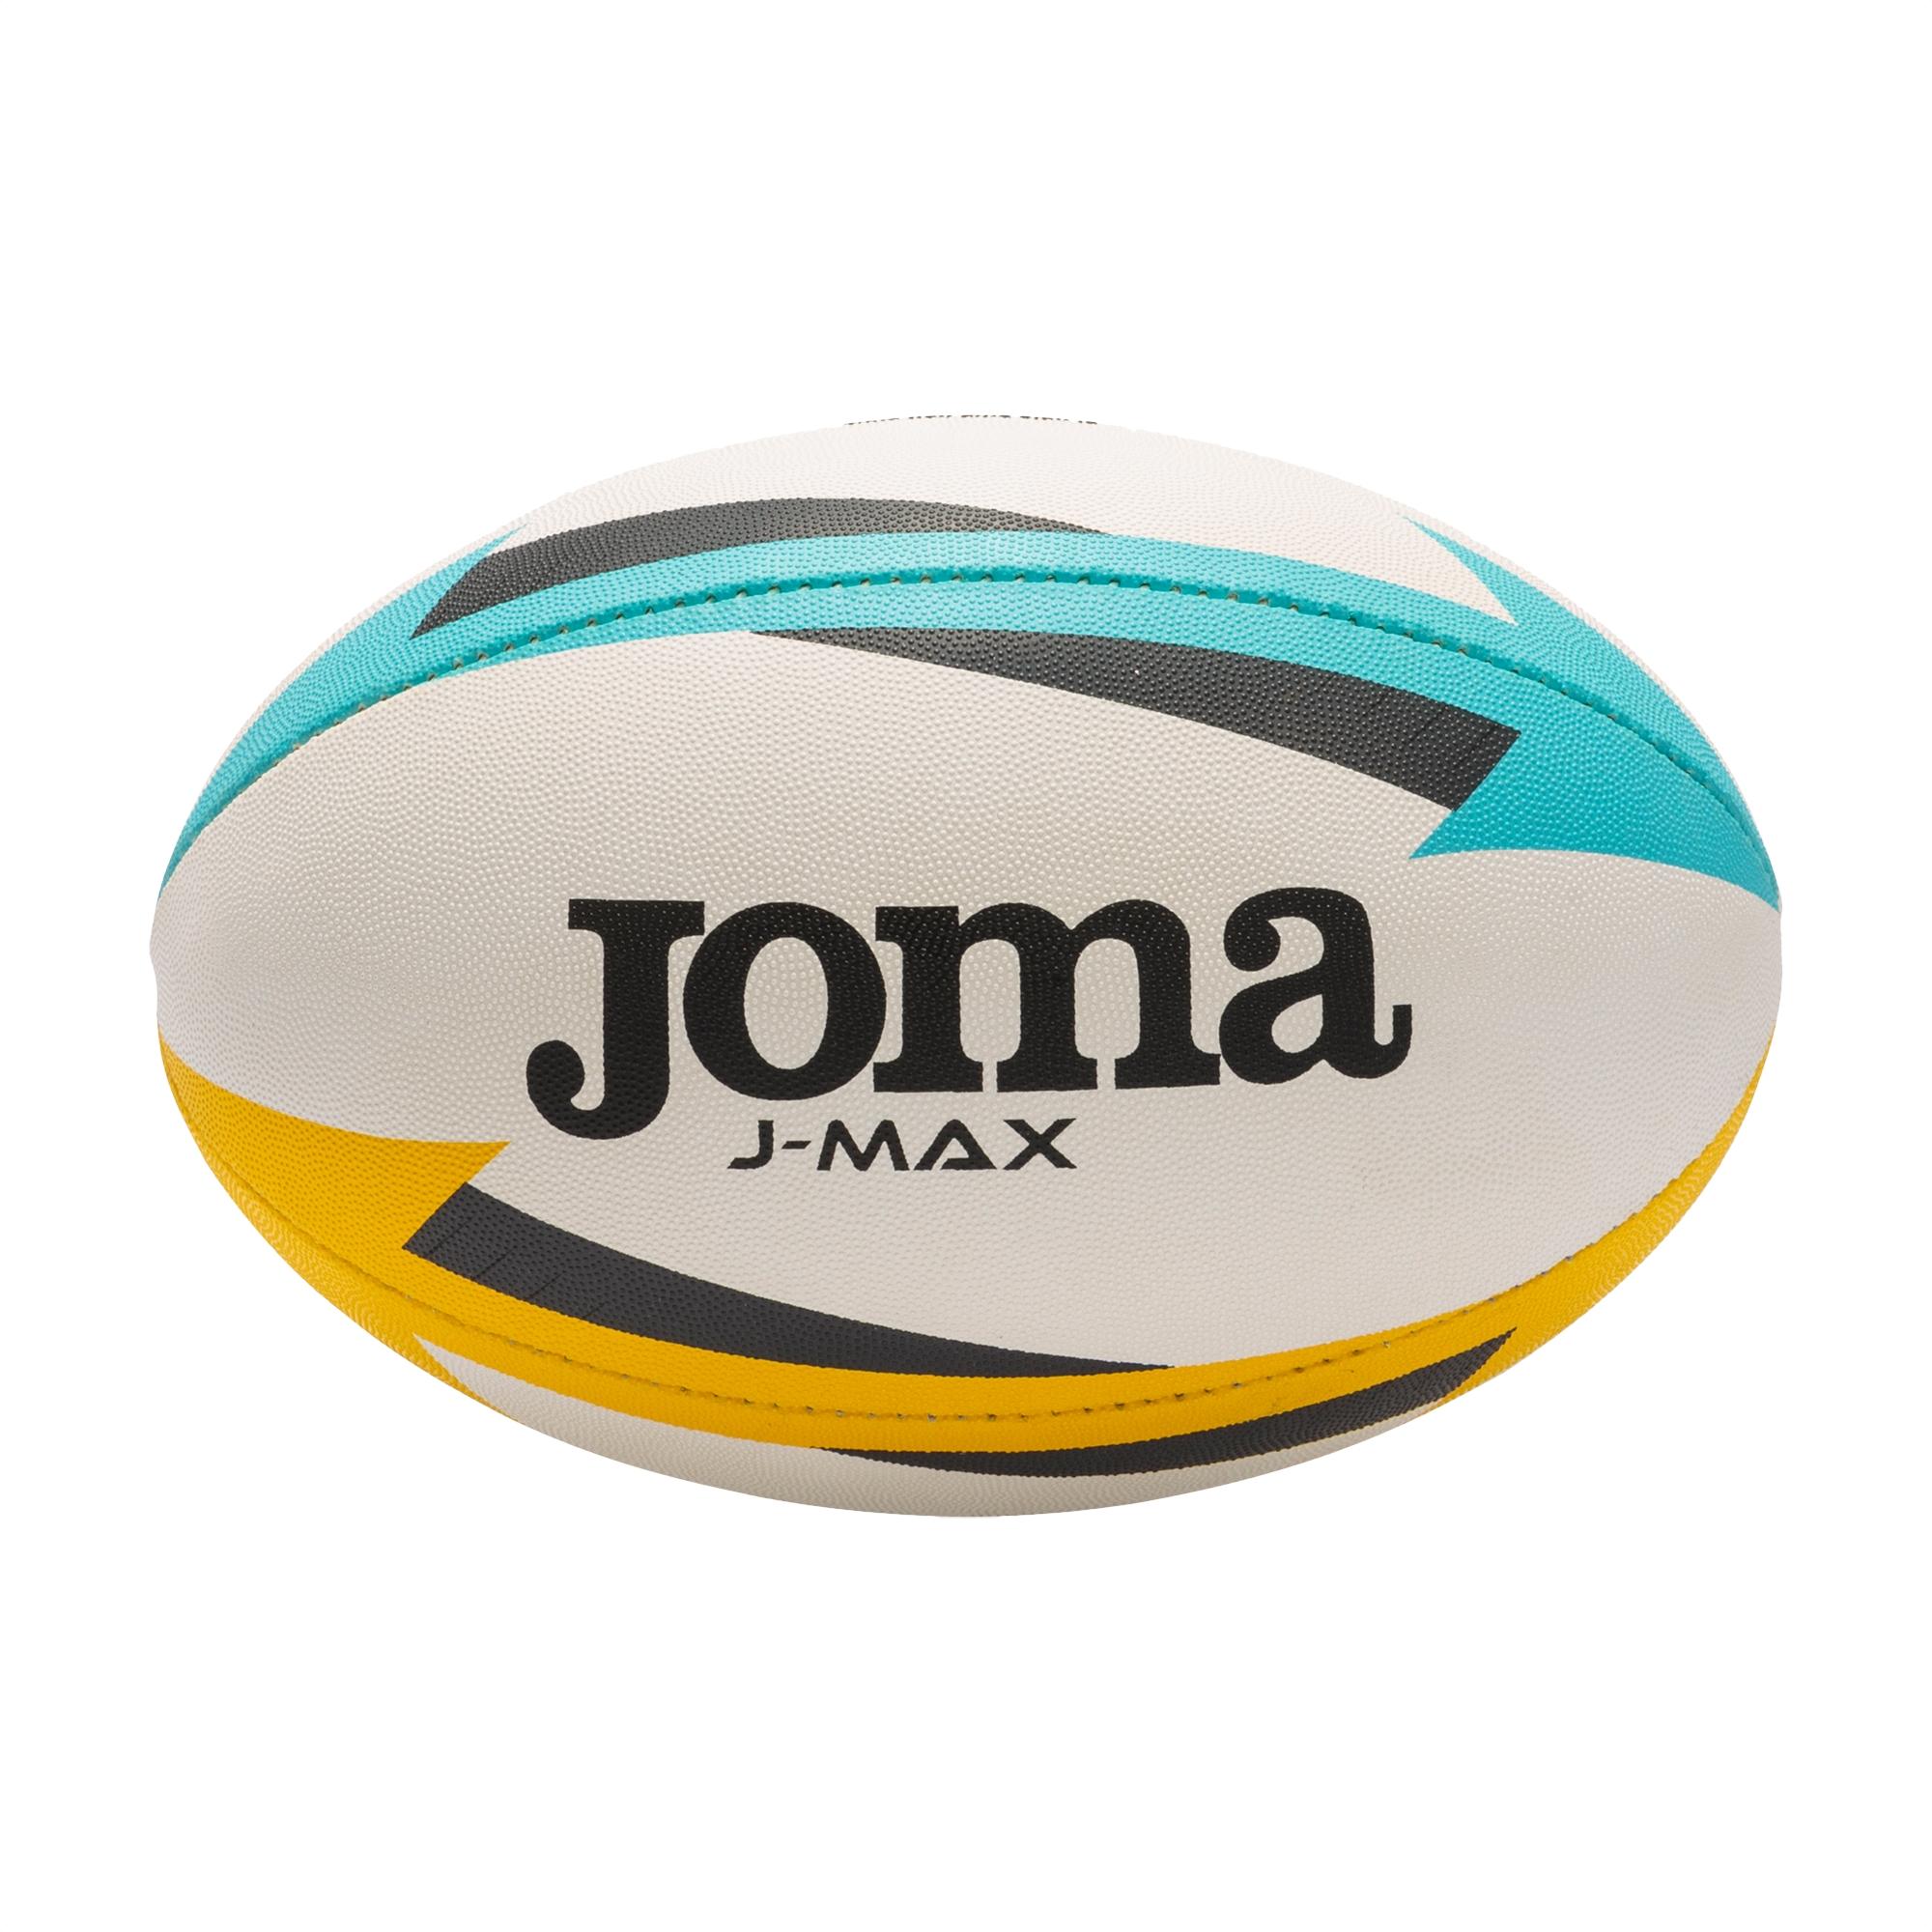 Minge rugby Joma J-max, marime 3